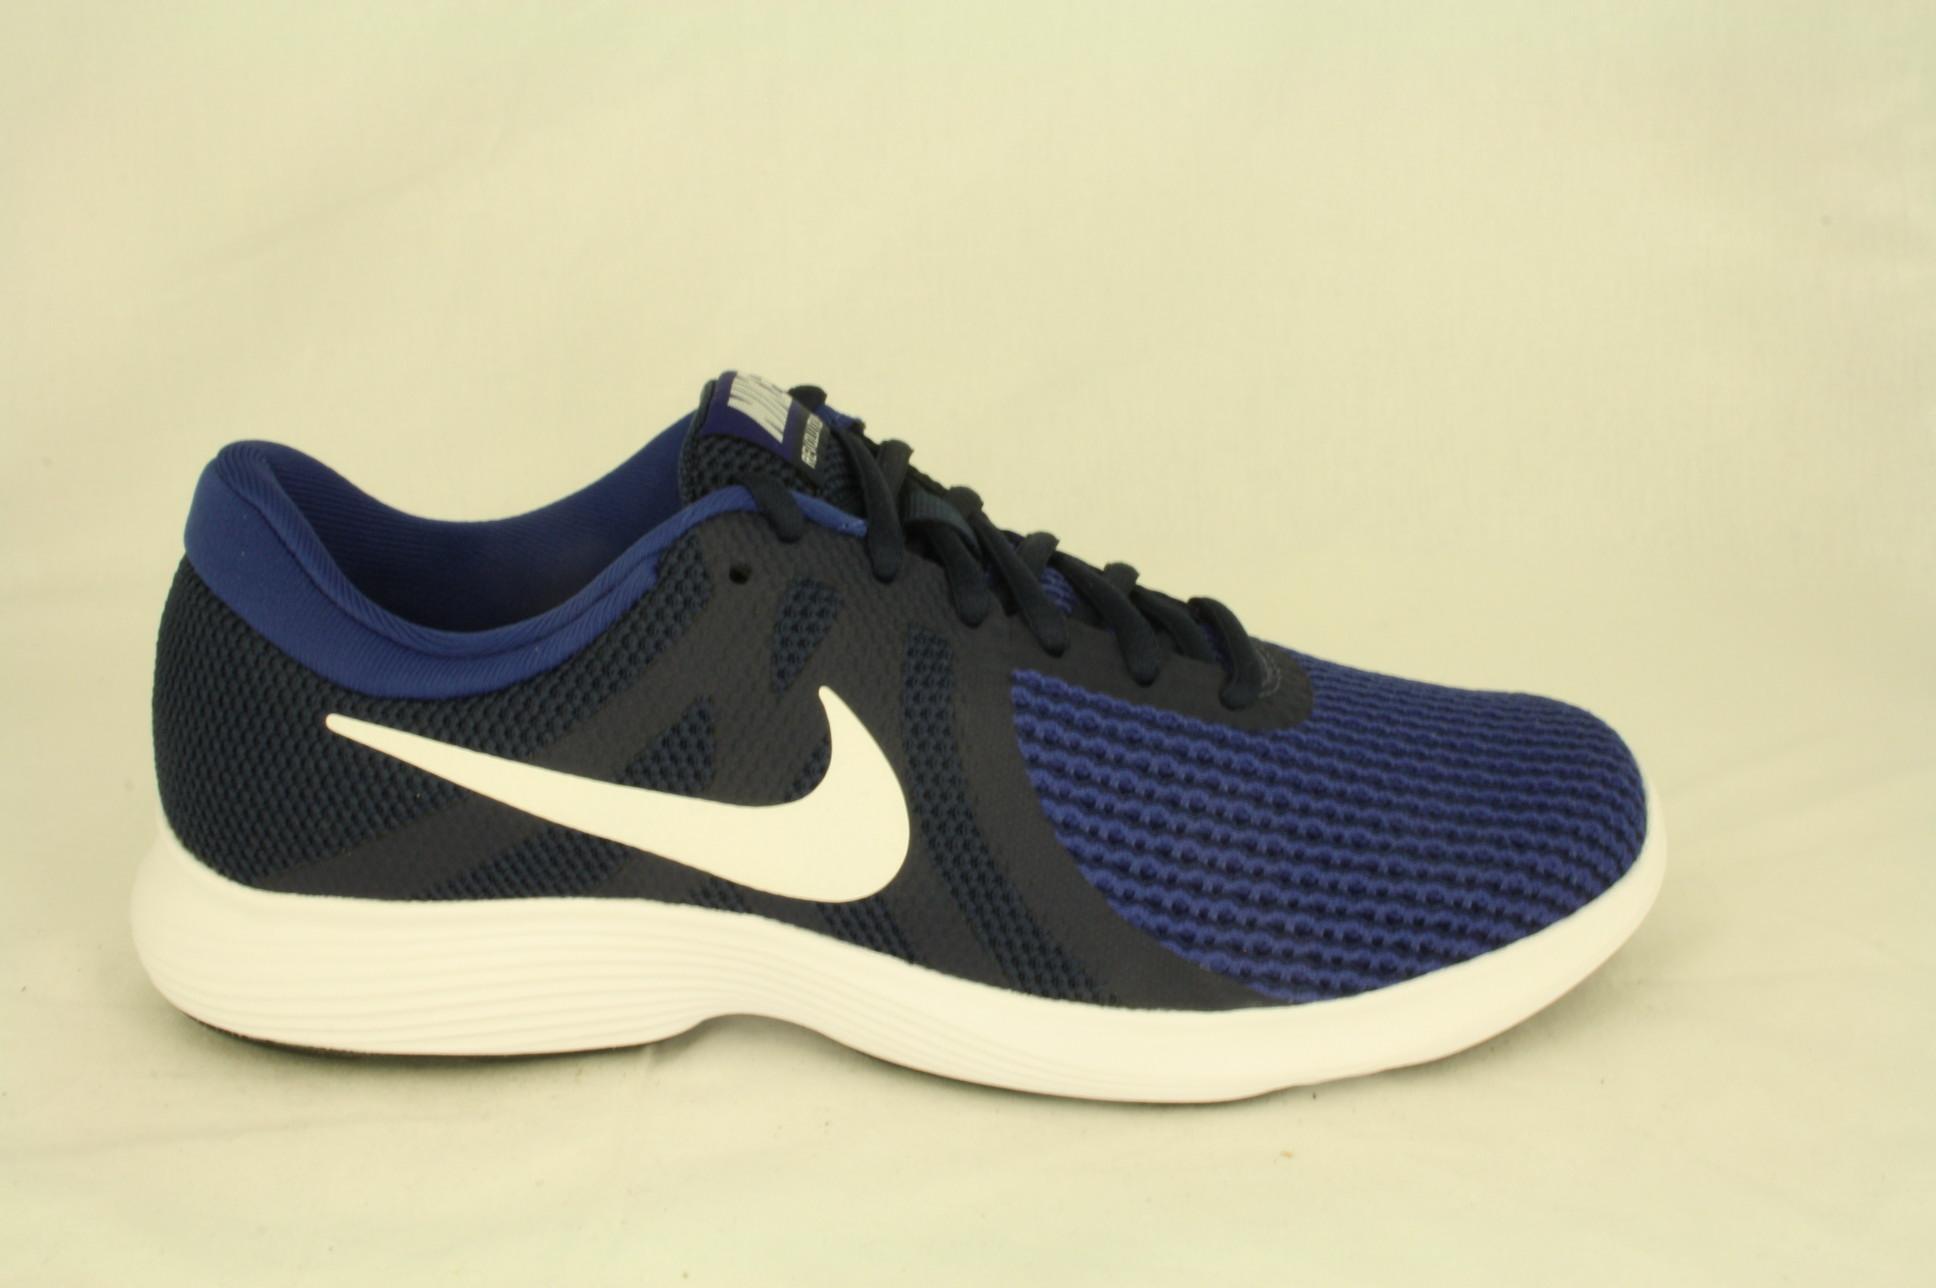 Dwars schoen en sportmode Nike: voetbalschoen, Mercurial